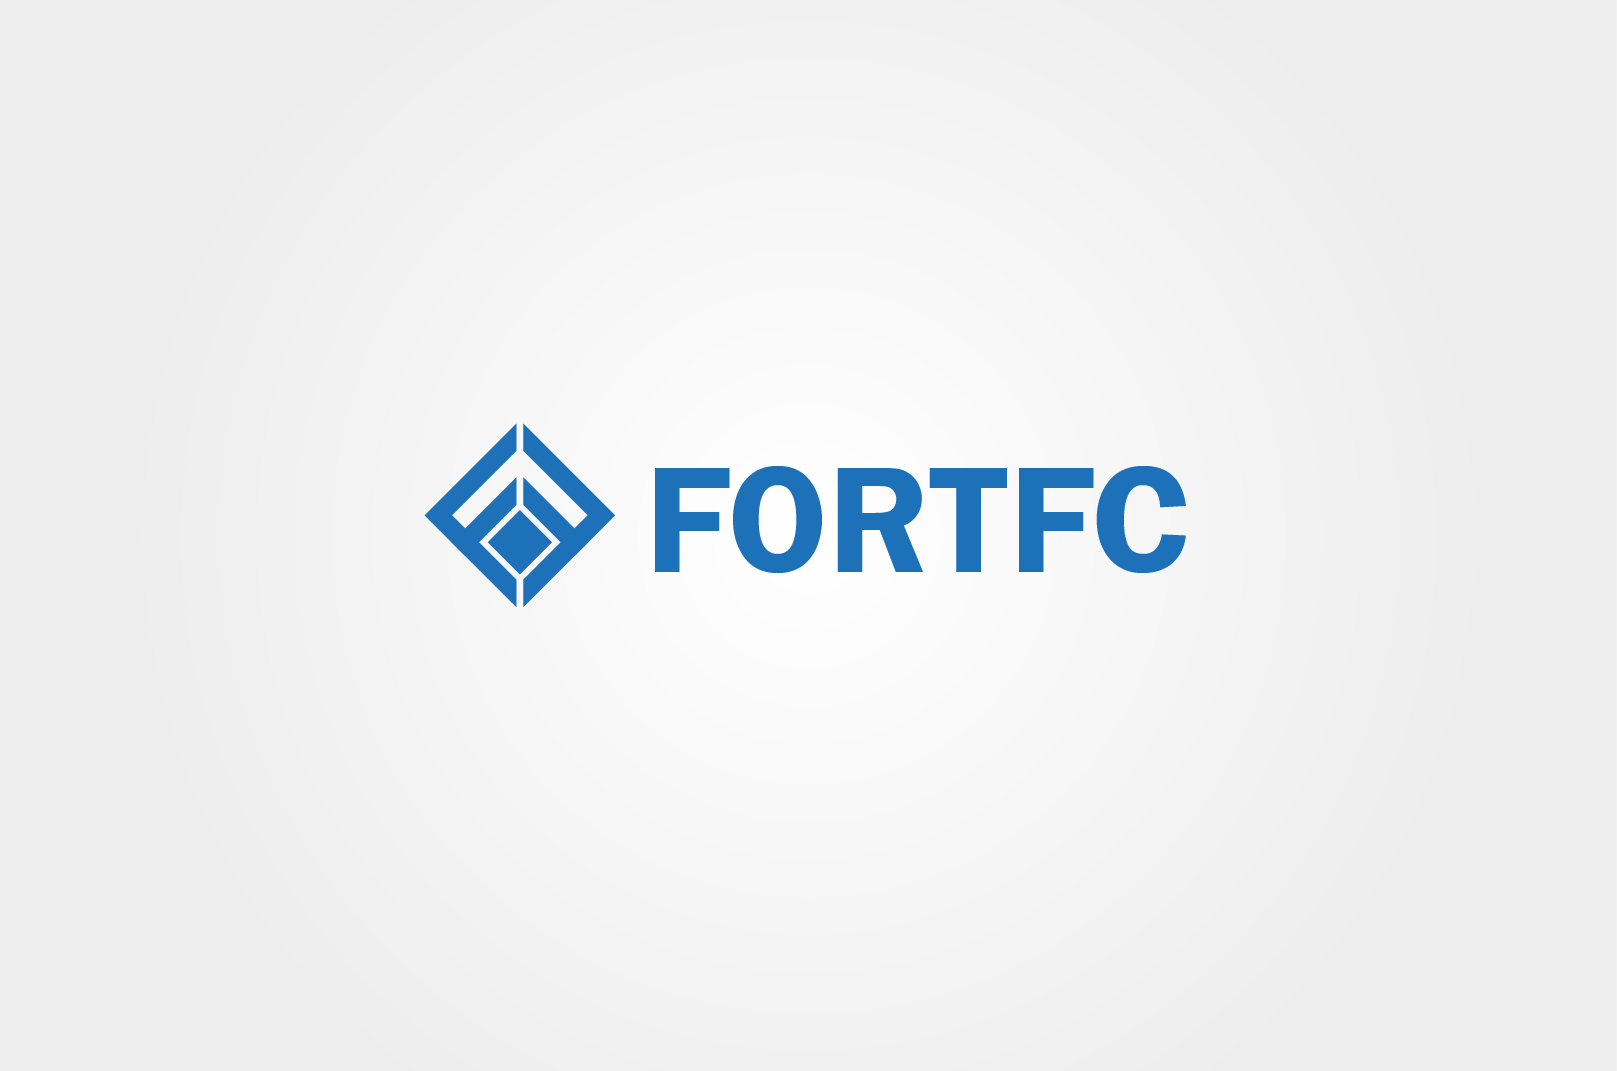 Разработка логотипа финансовой компании фото f_2295a83e05a998c9.jpg